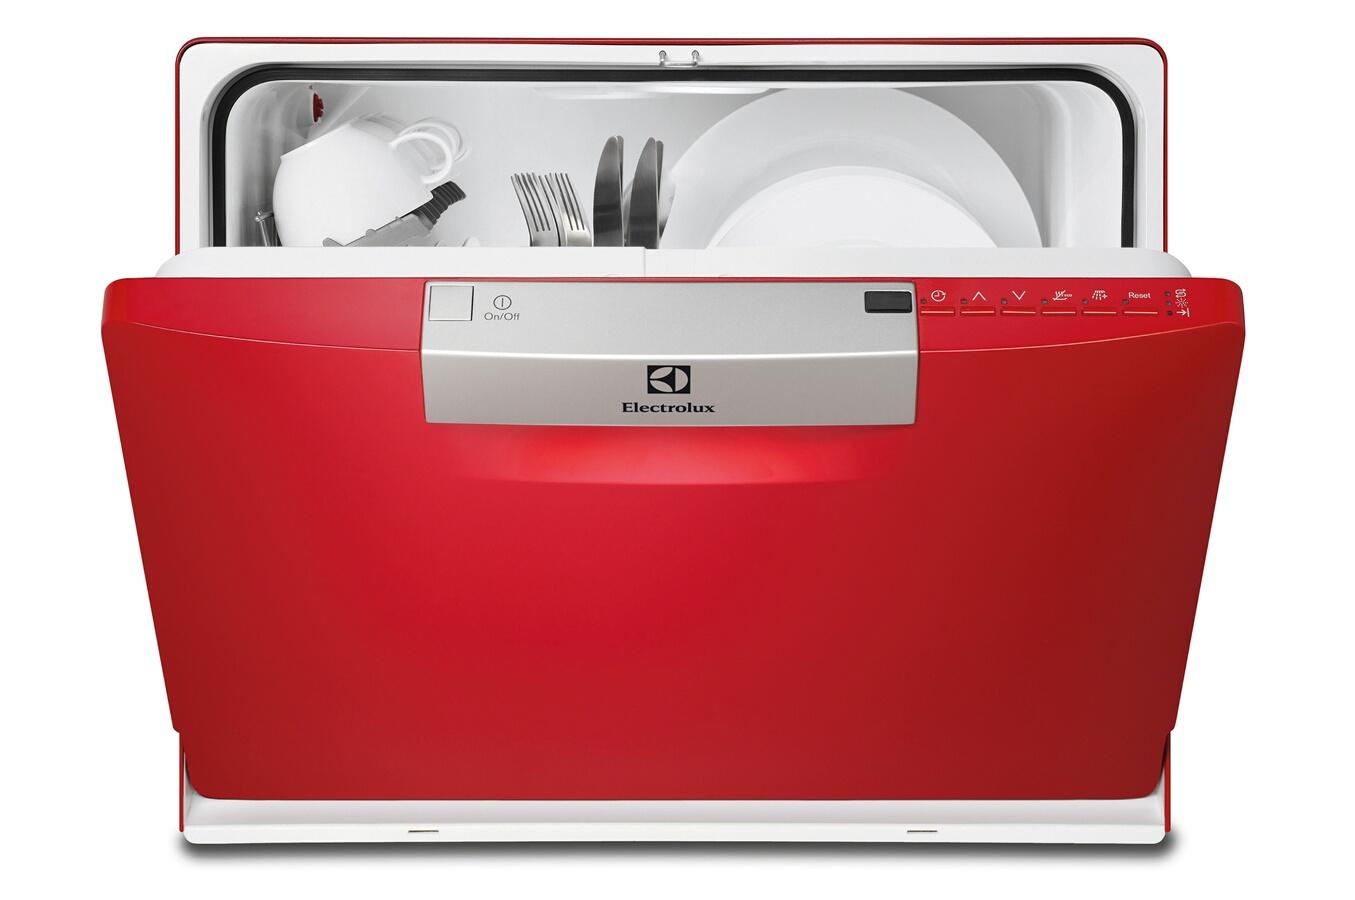 lave vaisselle electrolux esf2300oh rouge 3616606 darty. Black Bedroom Furniture Sets. Home Design Ideas